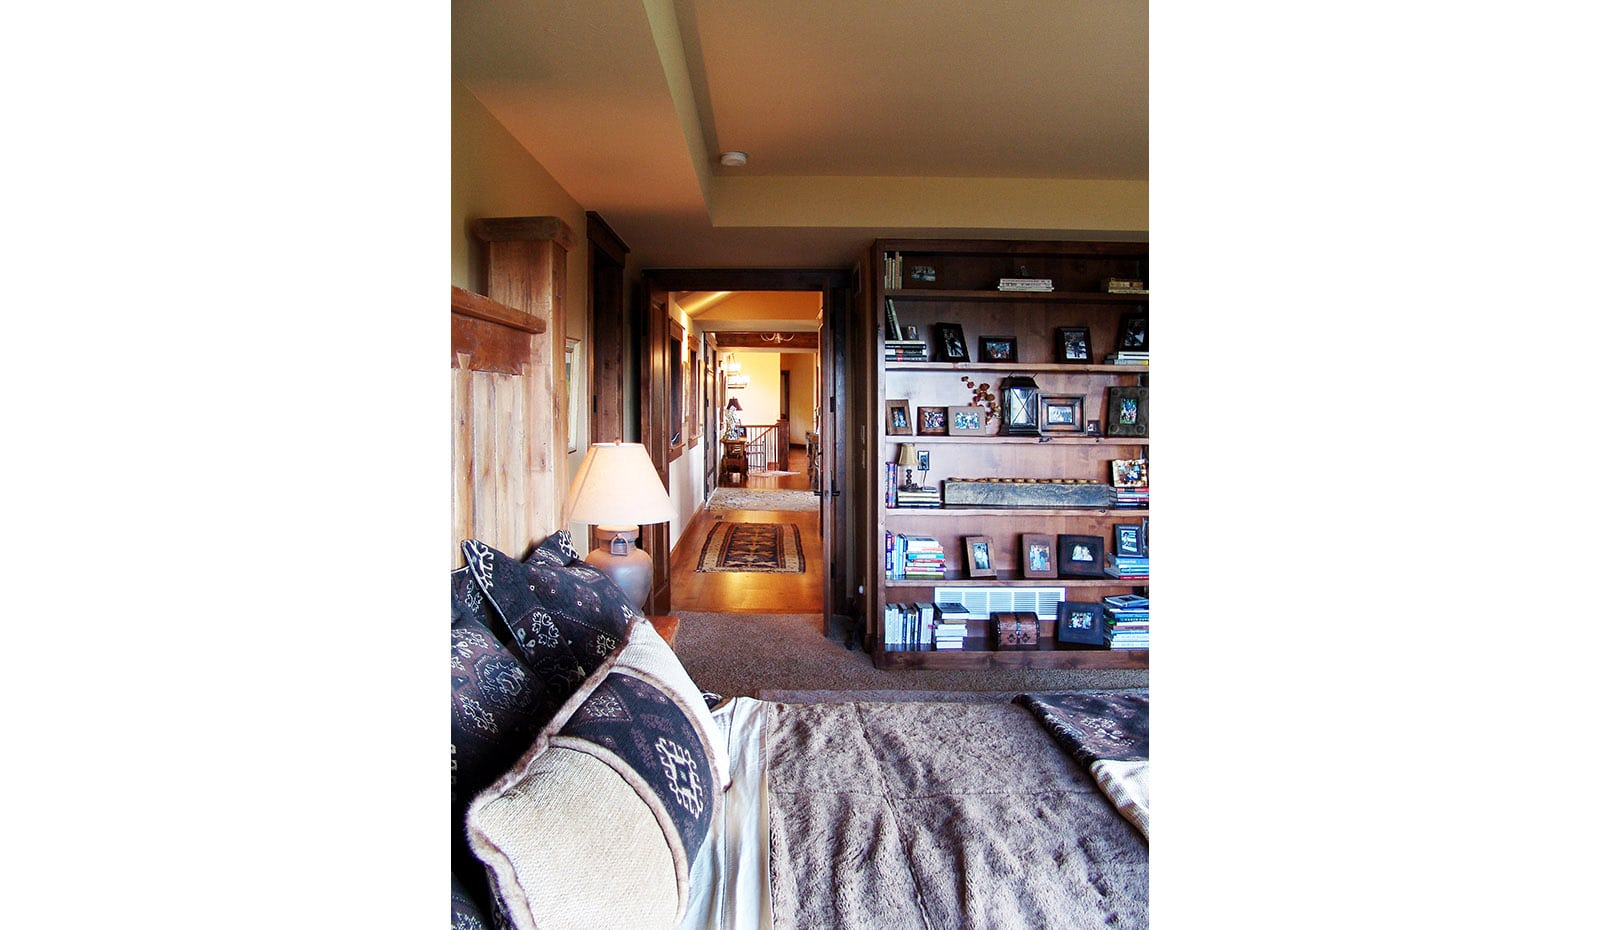 LarkspurResidence_interior_27_1600x930